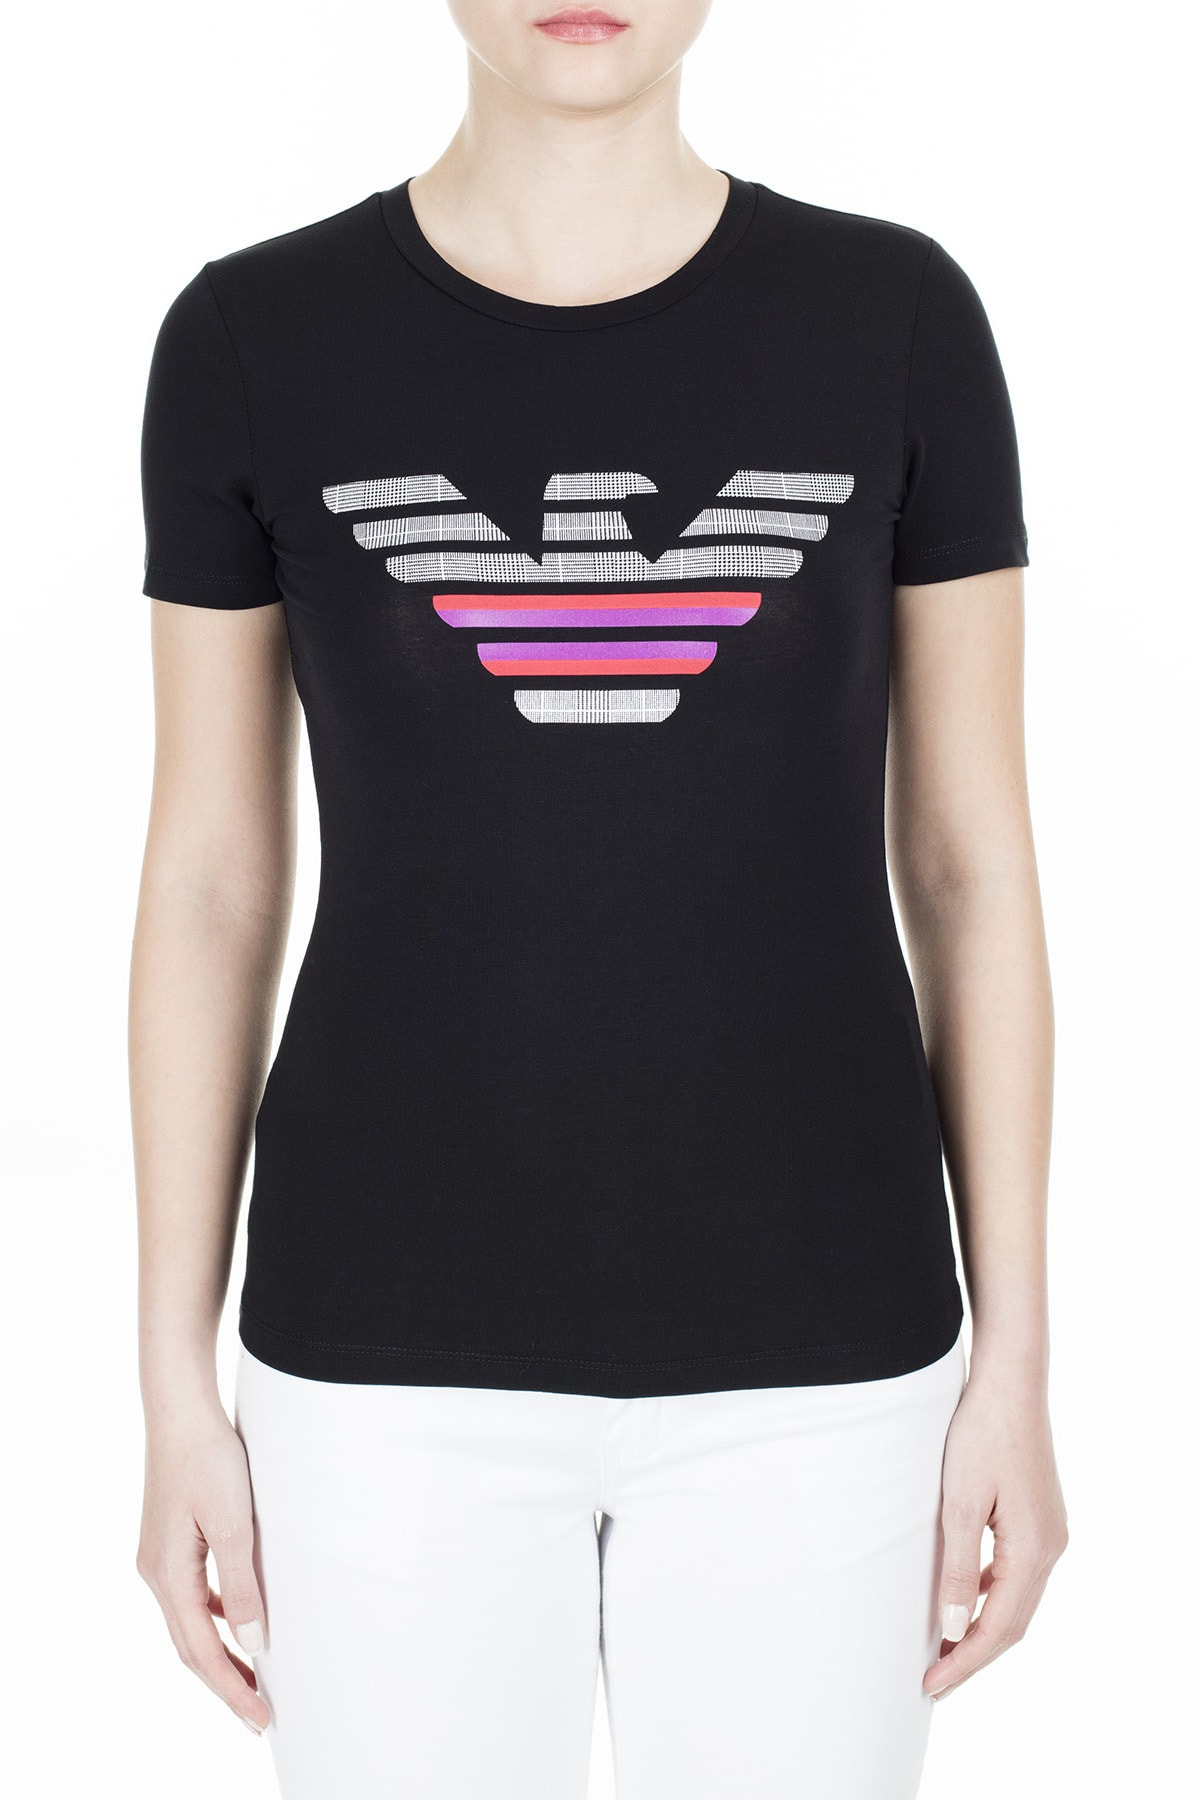 Emporio Armani Kadın Siyah T-Shirt 3H2T8A 2J07Z 0999